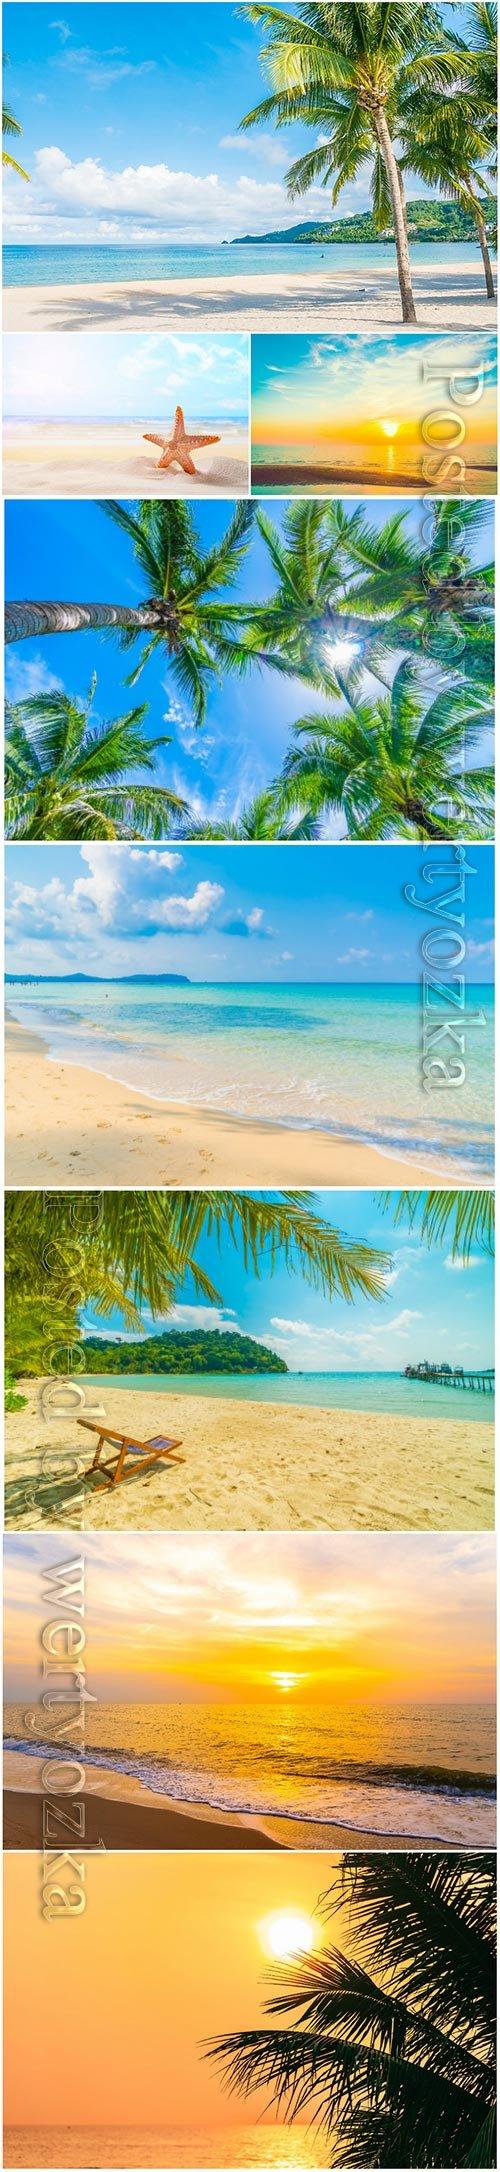 Beautiful tropical beach, palm tree, sunset at sea